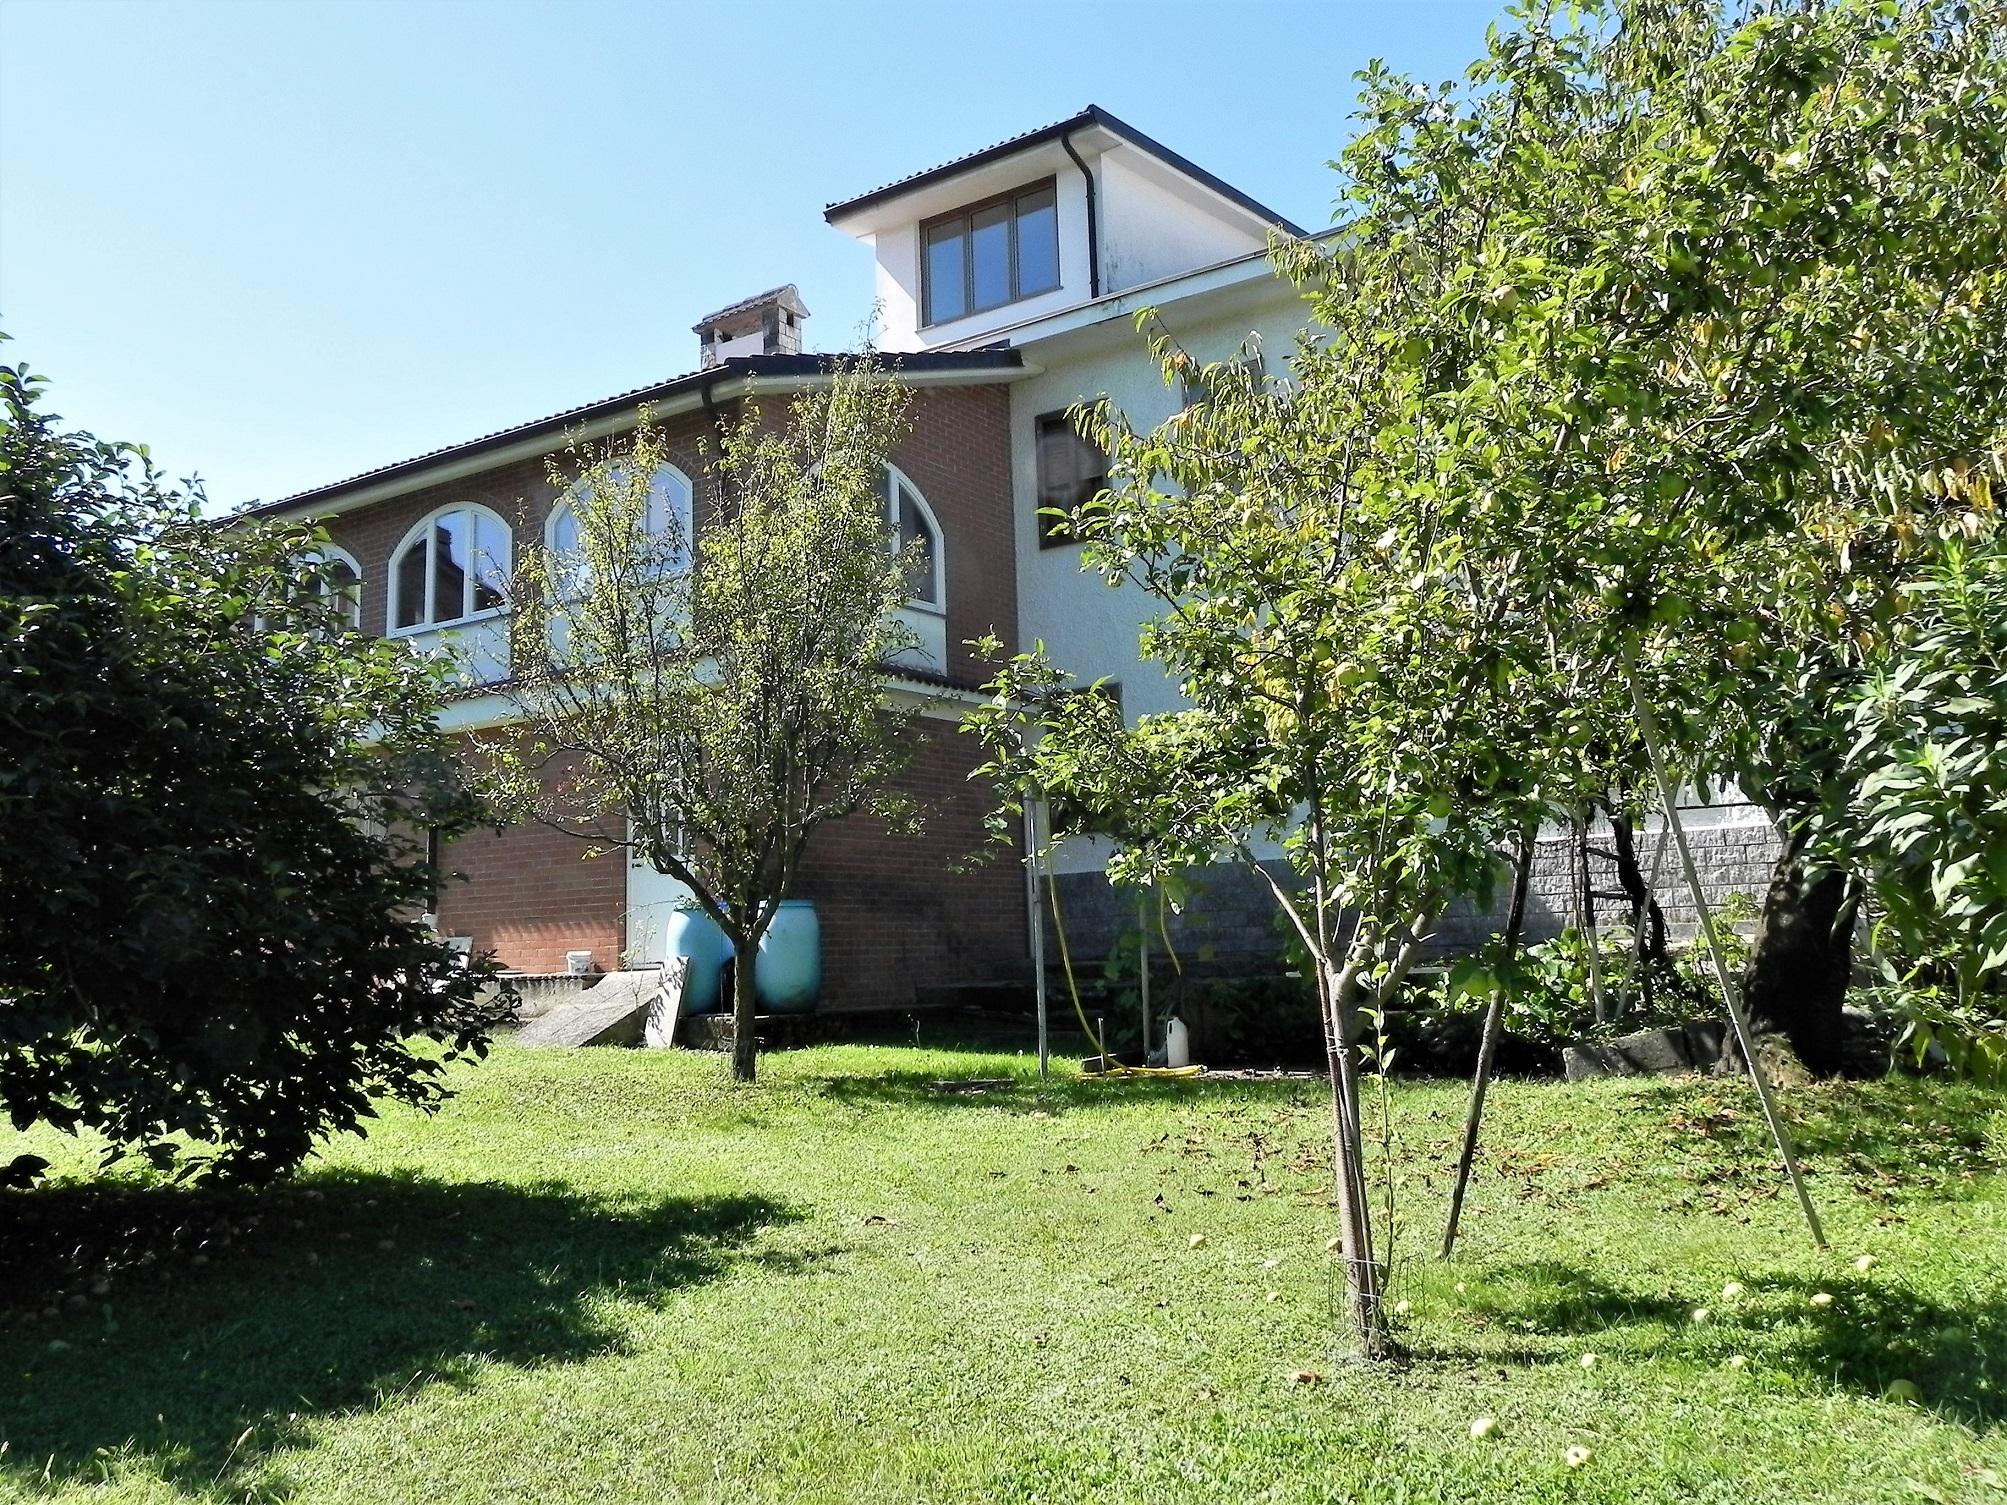 LA CASSA (TO) – Villa mq. 400